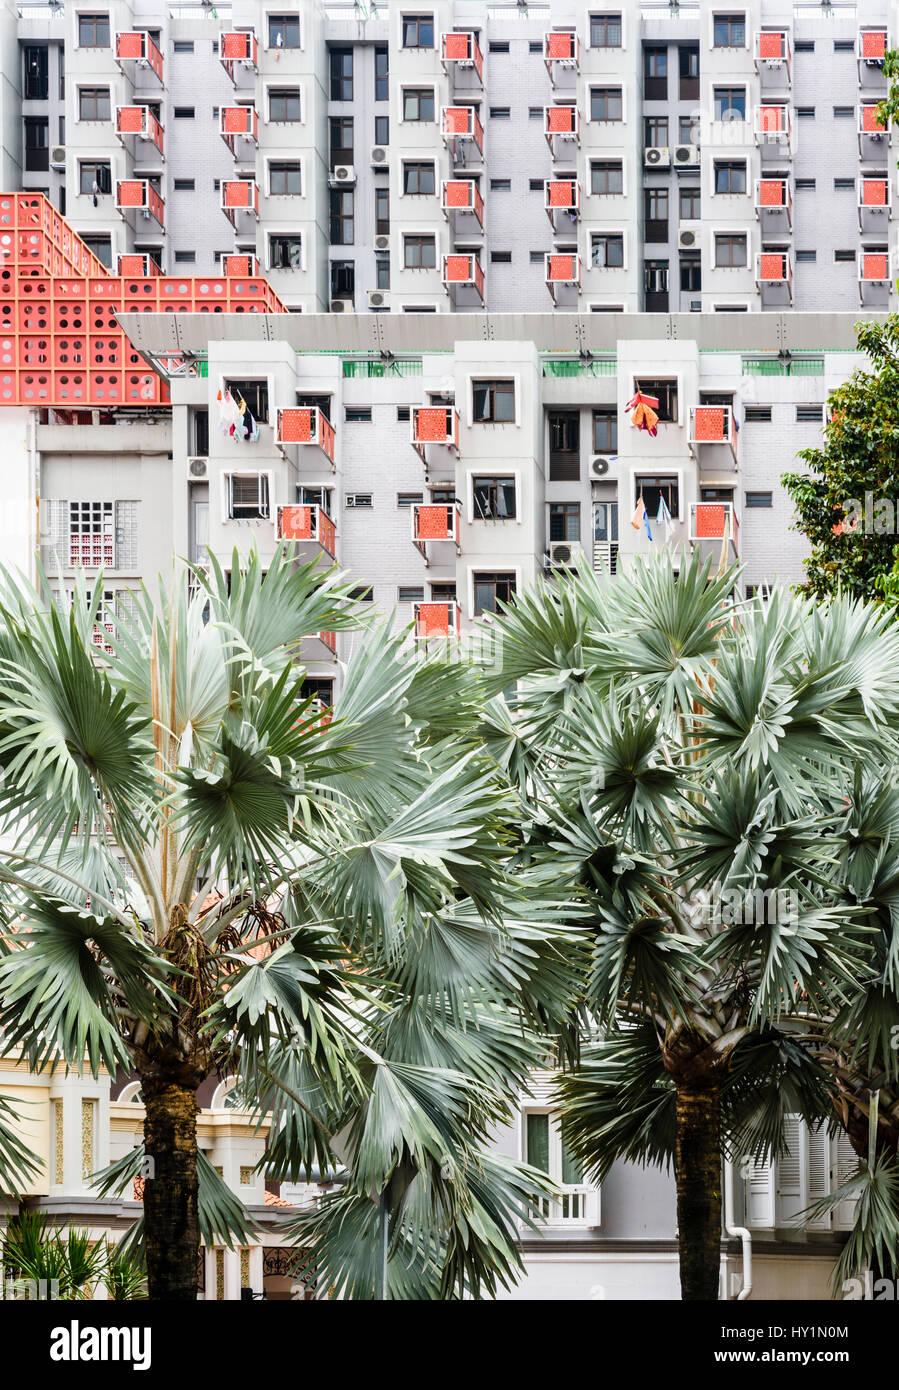 Singapore high-rise living at Selegie House along Selagie Rd, Singapore - Stock Image